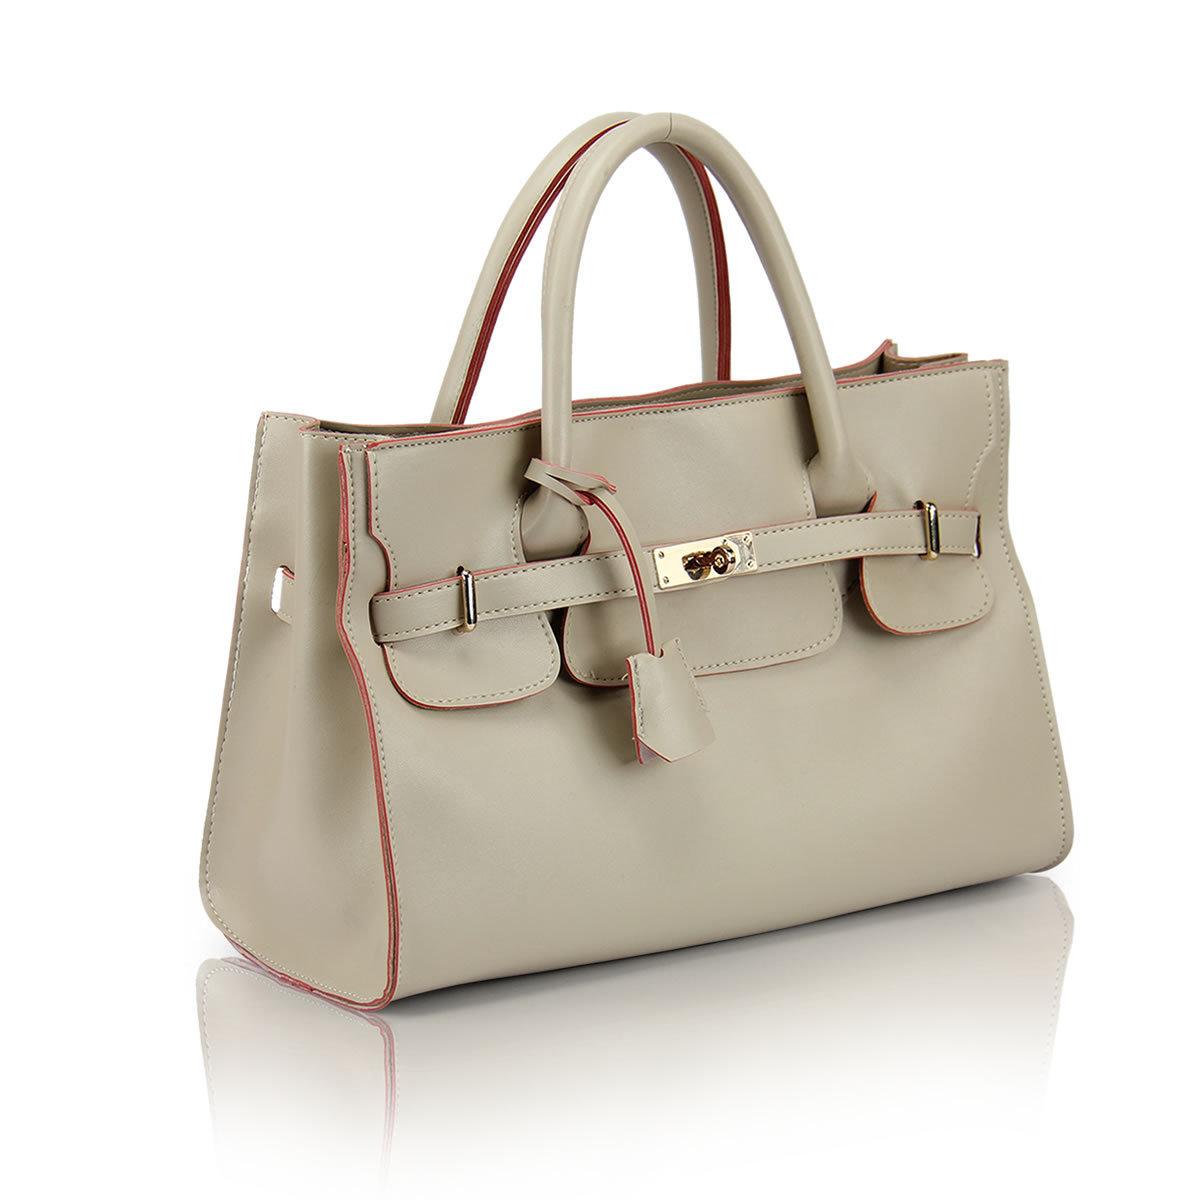 2013 women's fashion vintage handbag strap decoration fashion all-match fashion bags